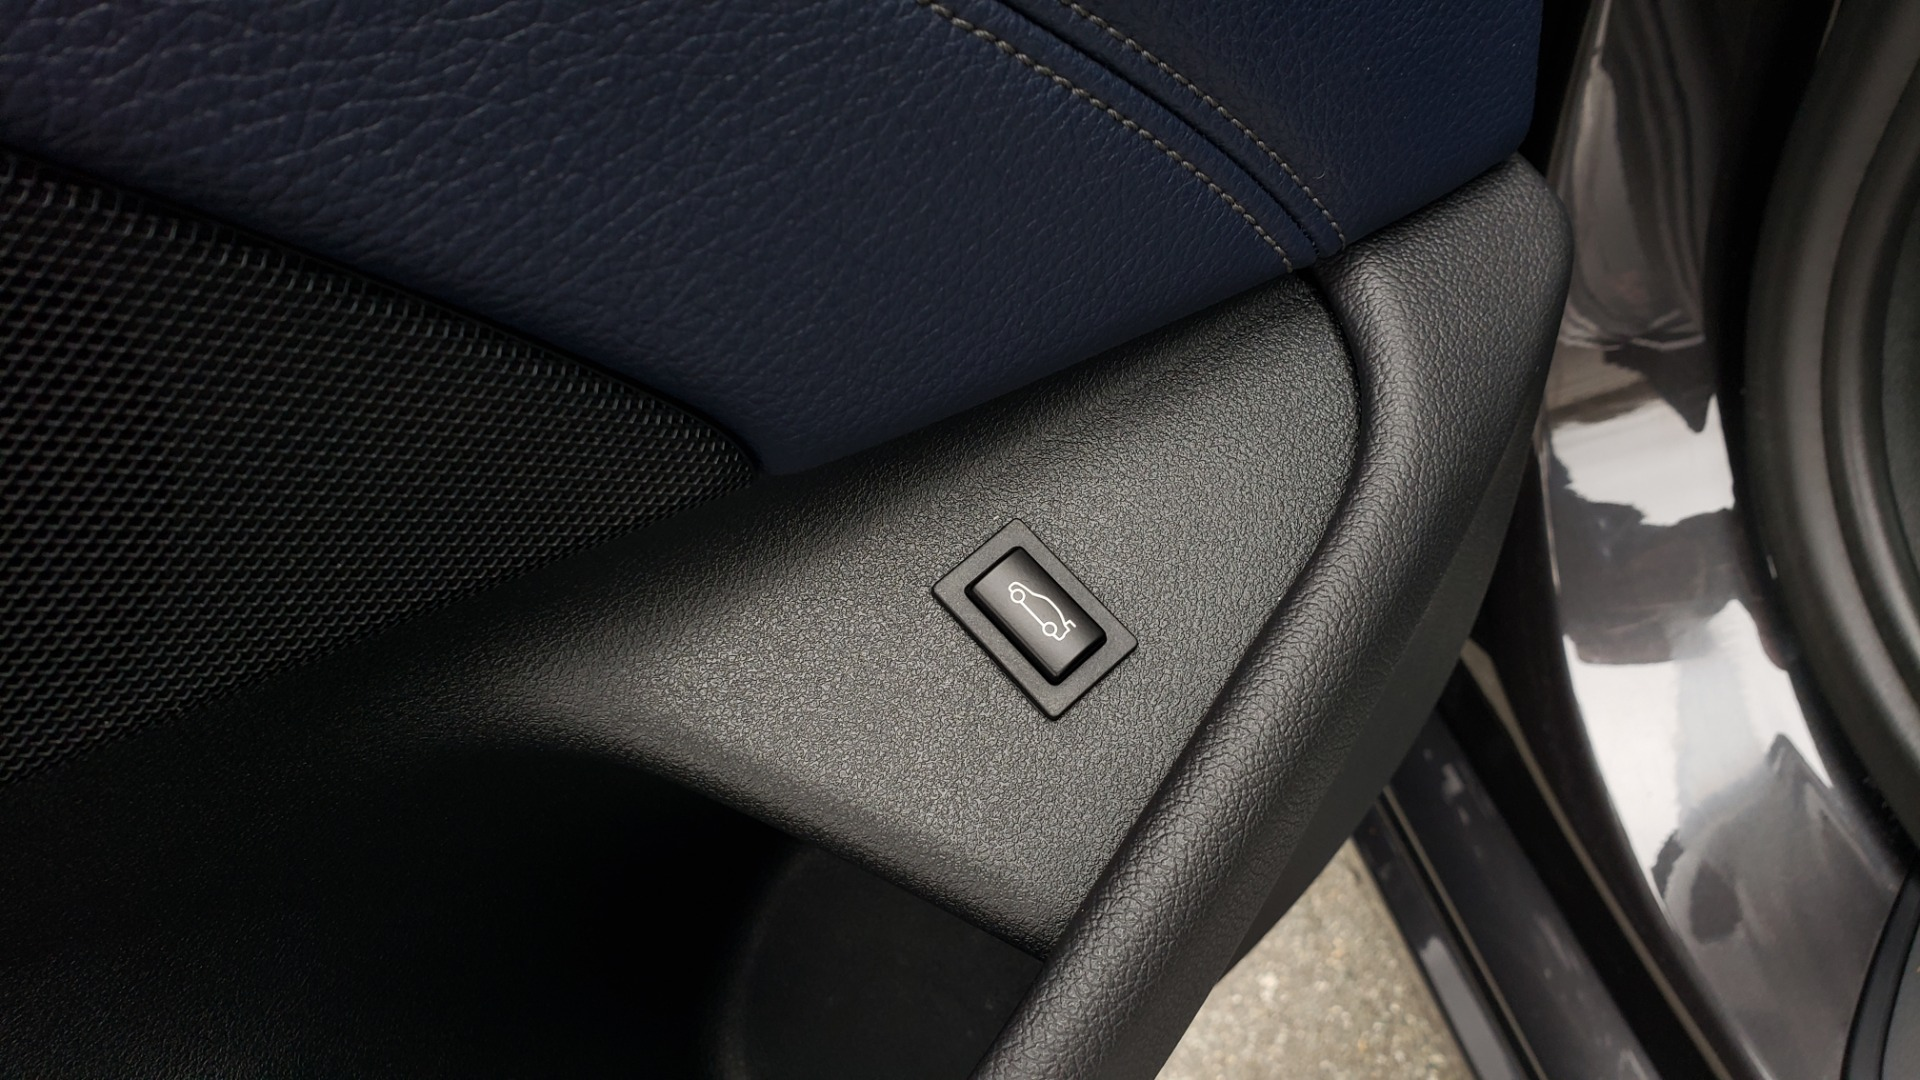 Used 2017 BMW 5 SERIES 530IXDRIVE / PREM PKG / DRVR ASST PLUS / CLD WTHR / APPLE CARPLAY for sale $30,595 at Formula Imports in Charlotte NC 28227 31